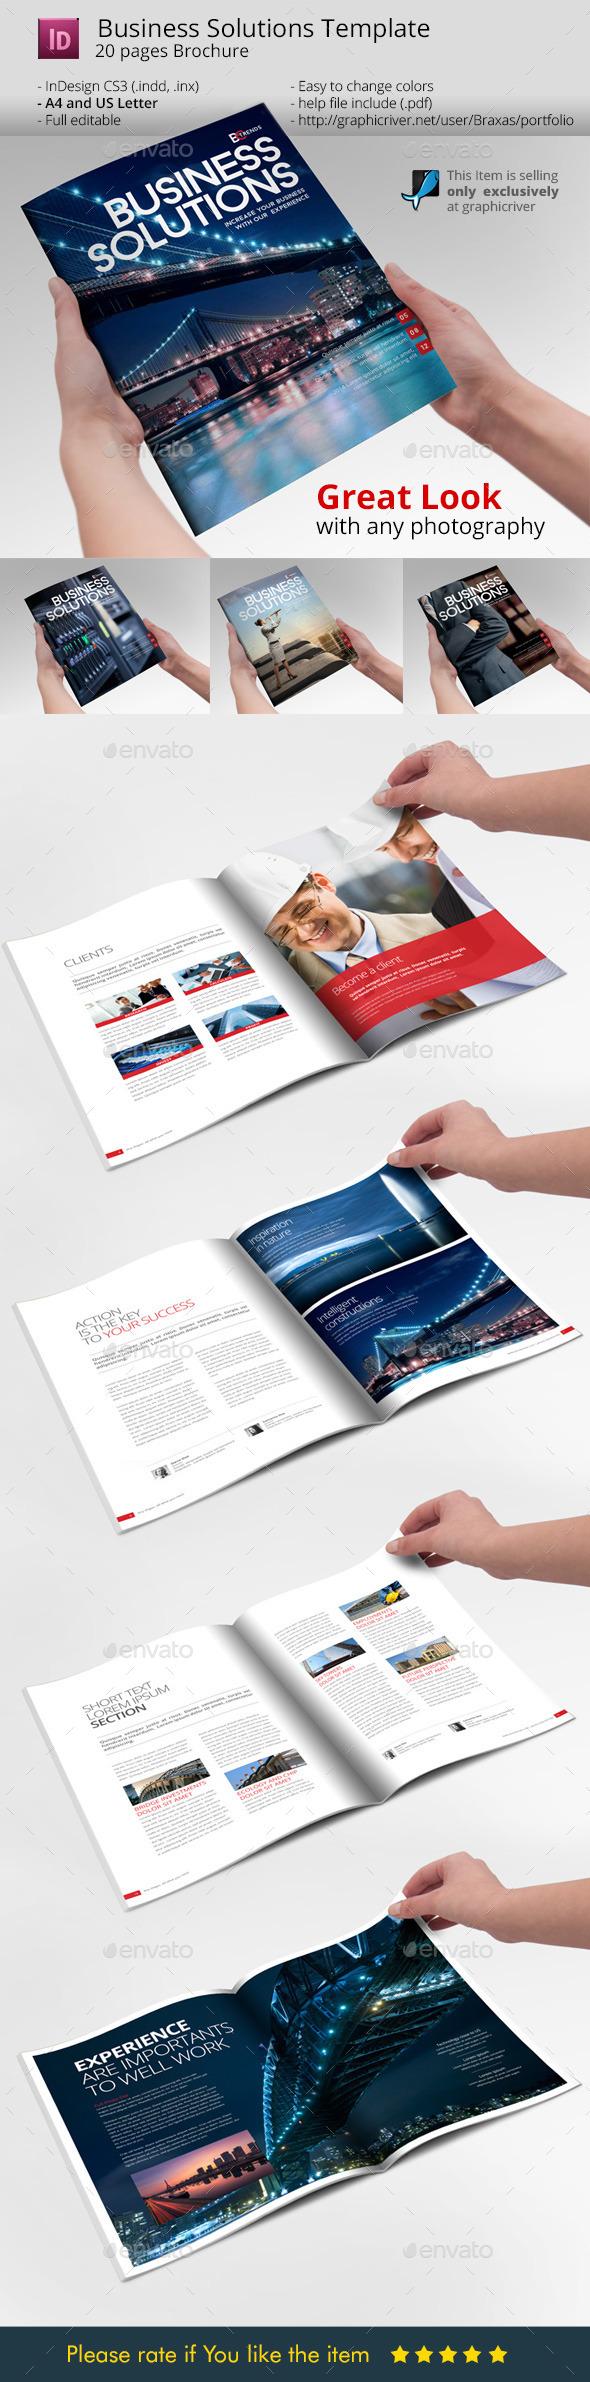 Business Solution Template Brochure - Informational Brochures